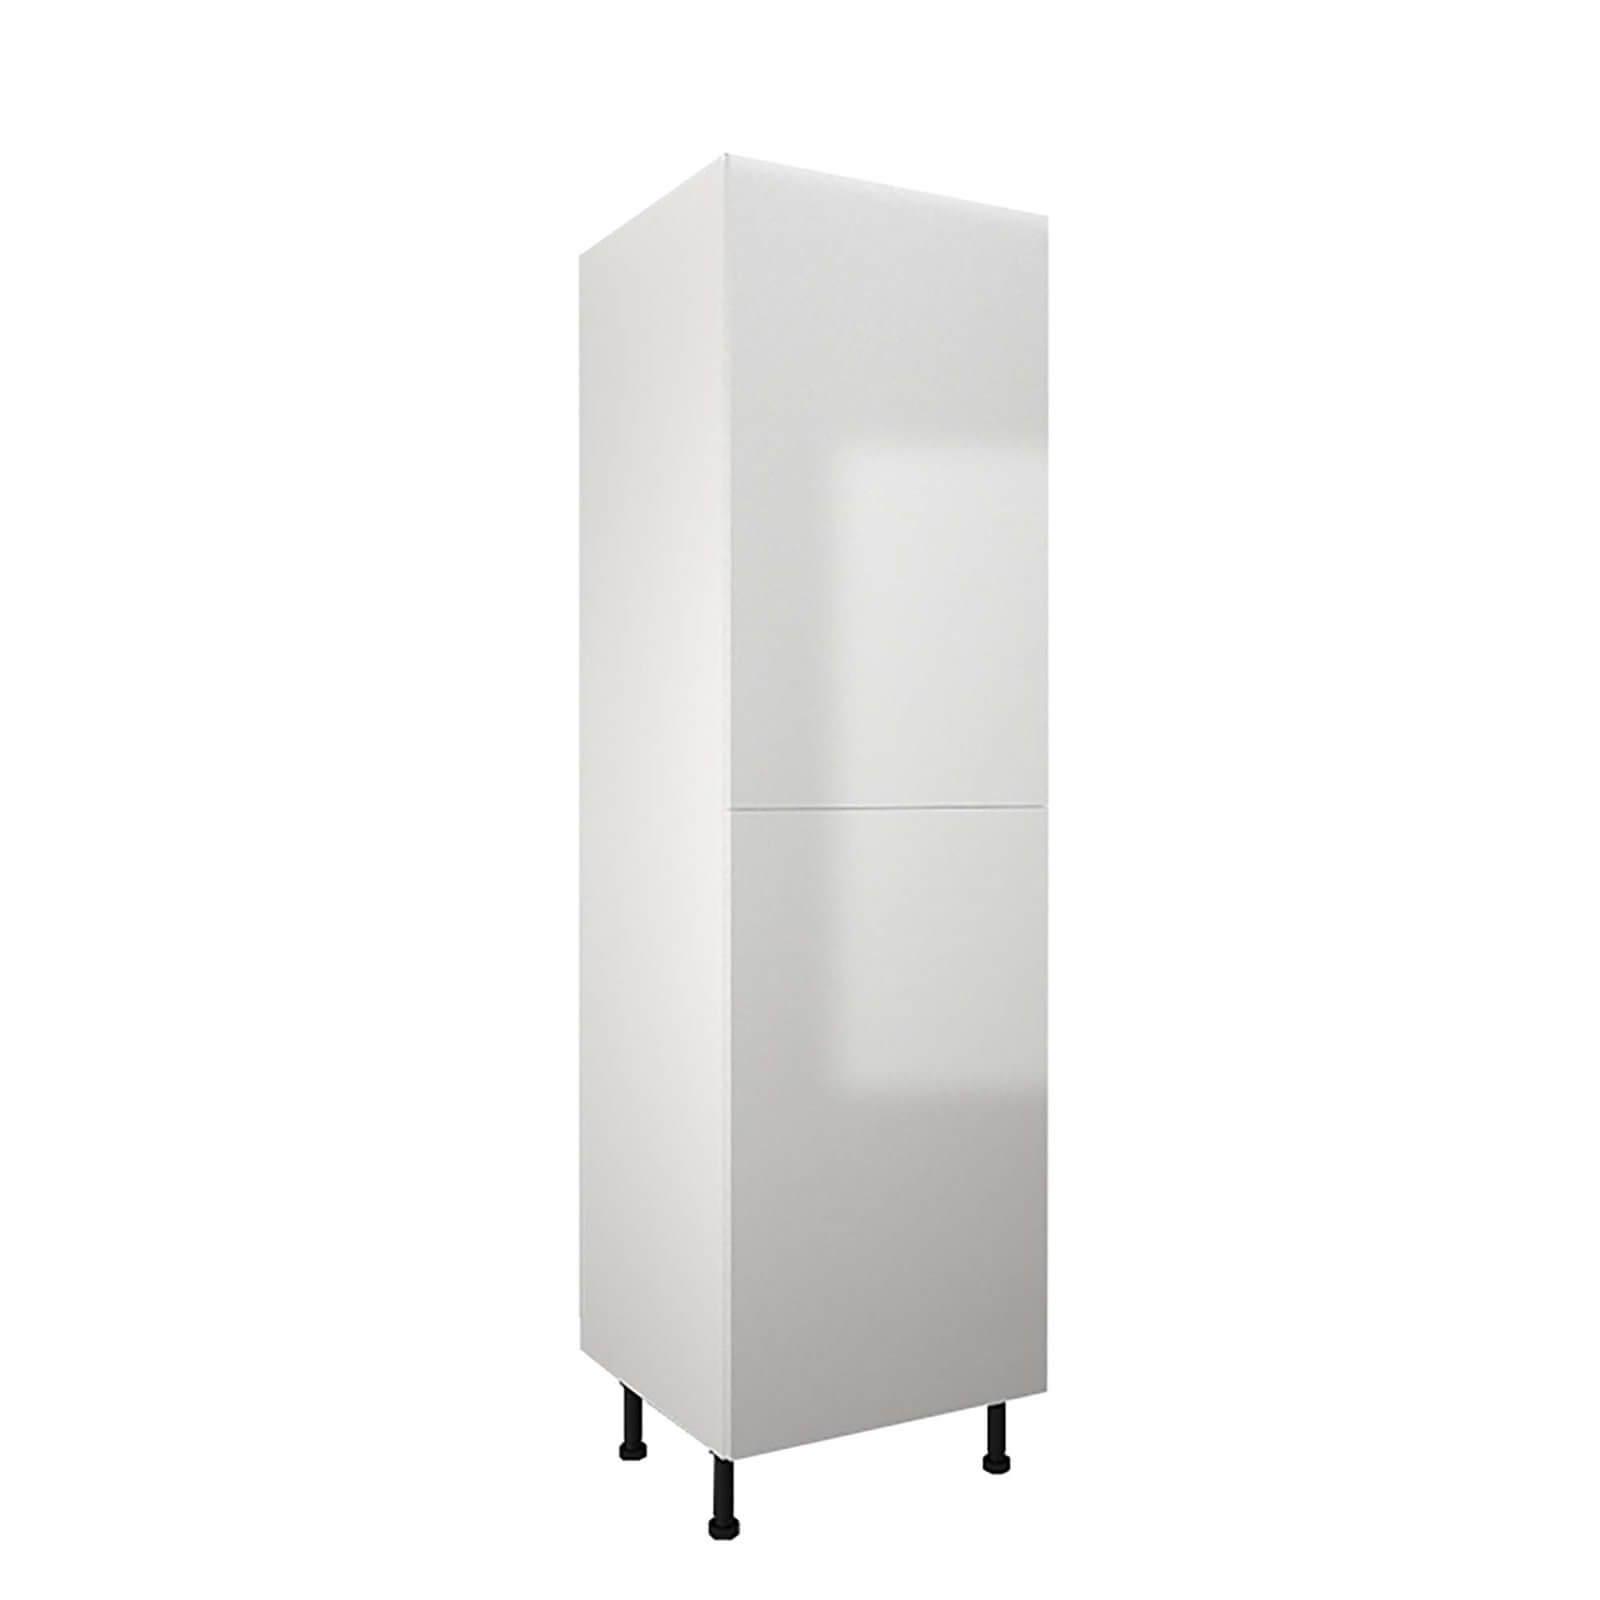 High Gloss Slab White 600mm Larder 50:50 Fridge Freezer Unit